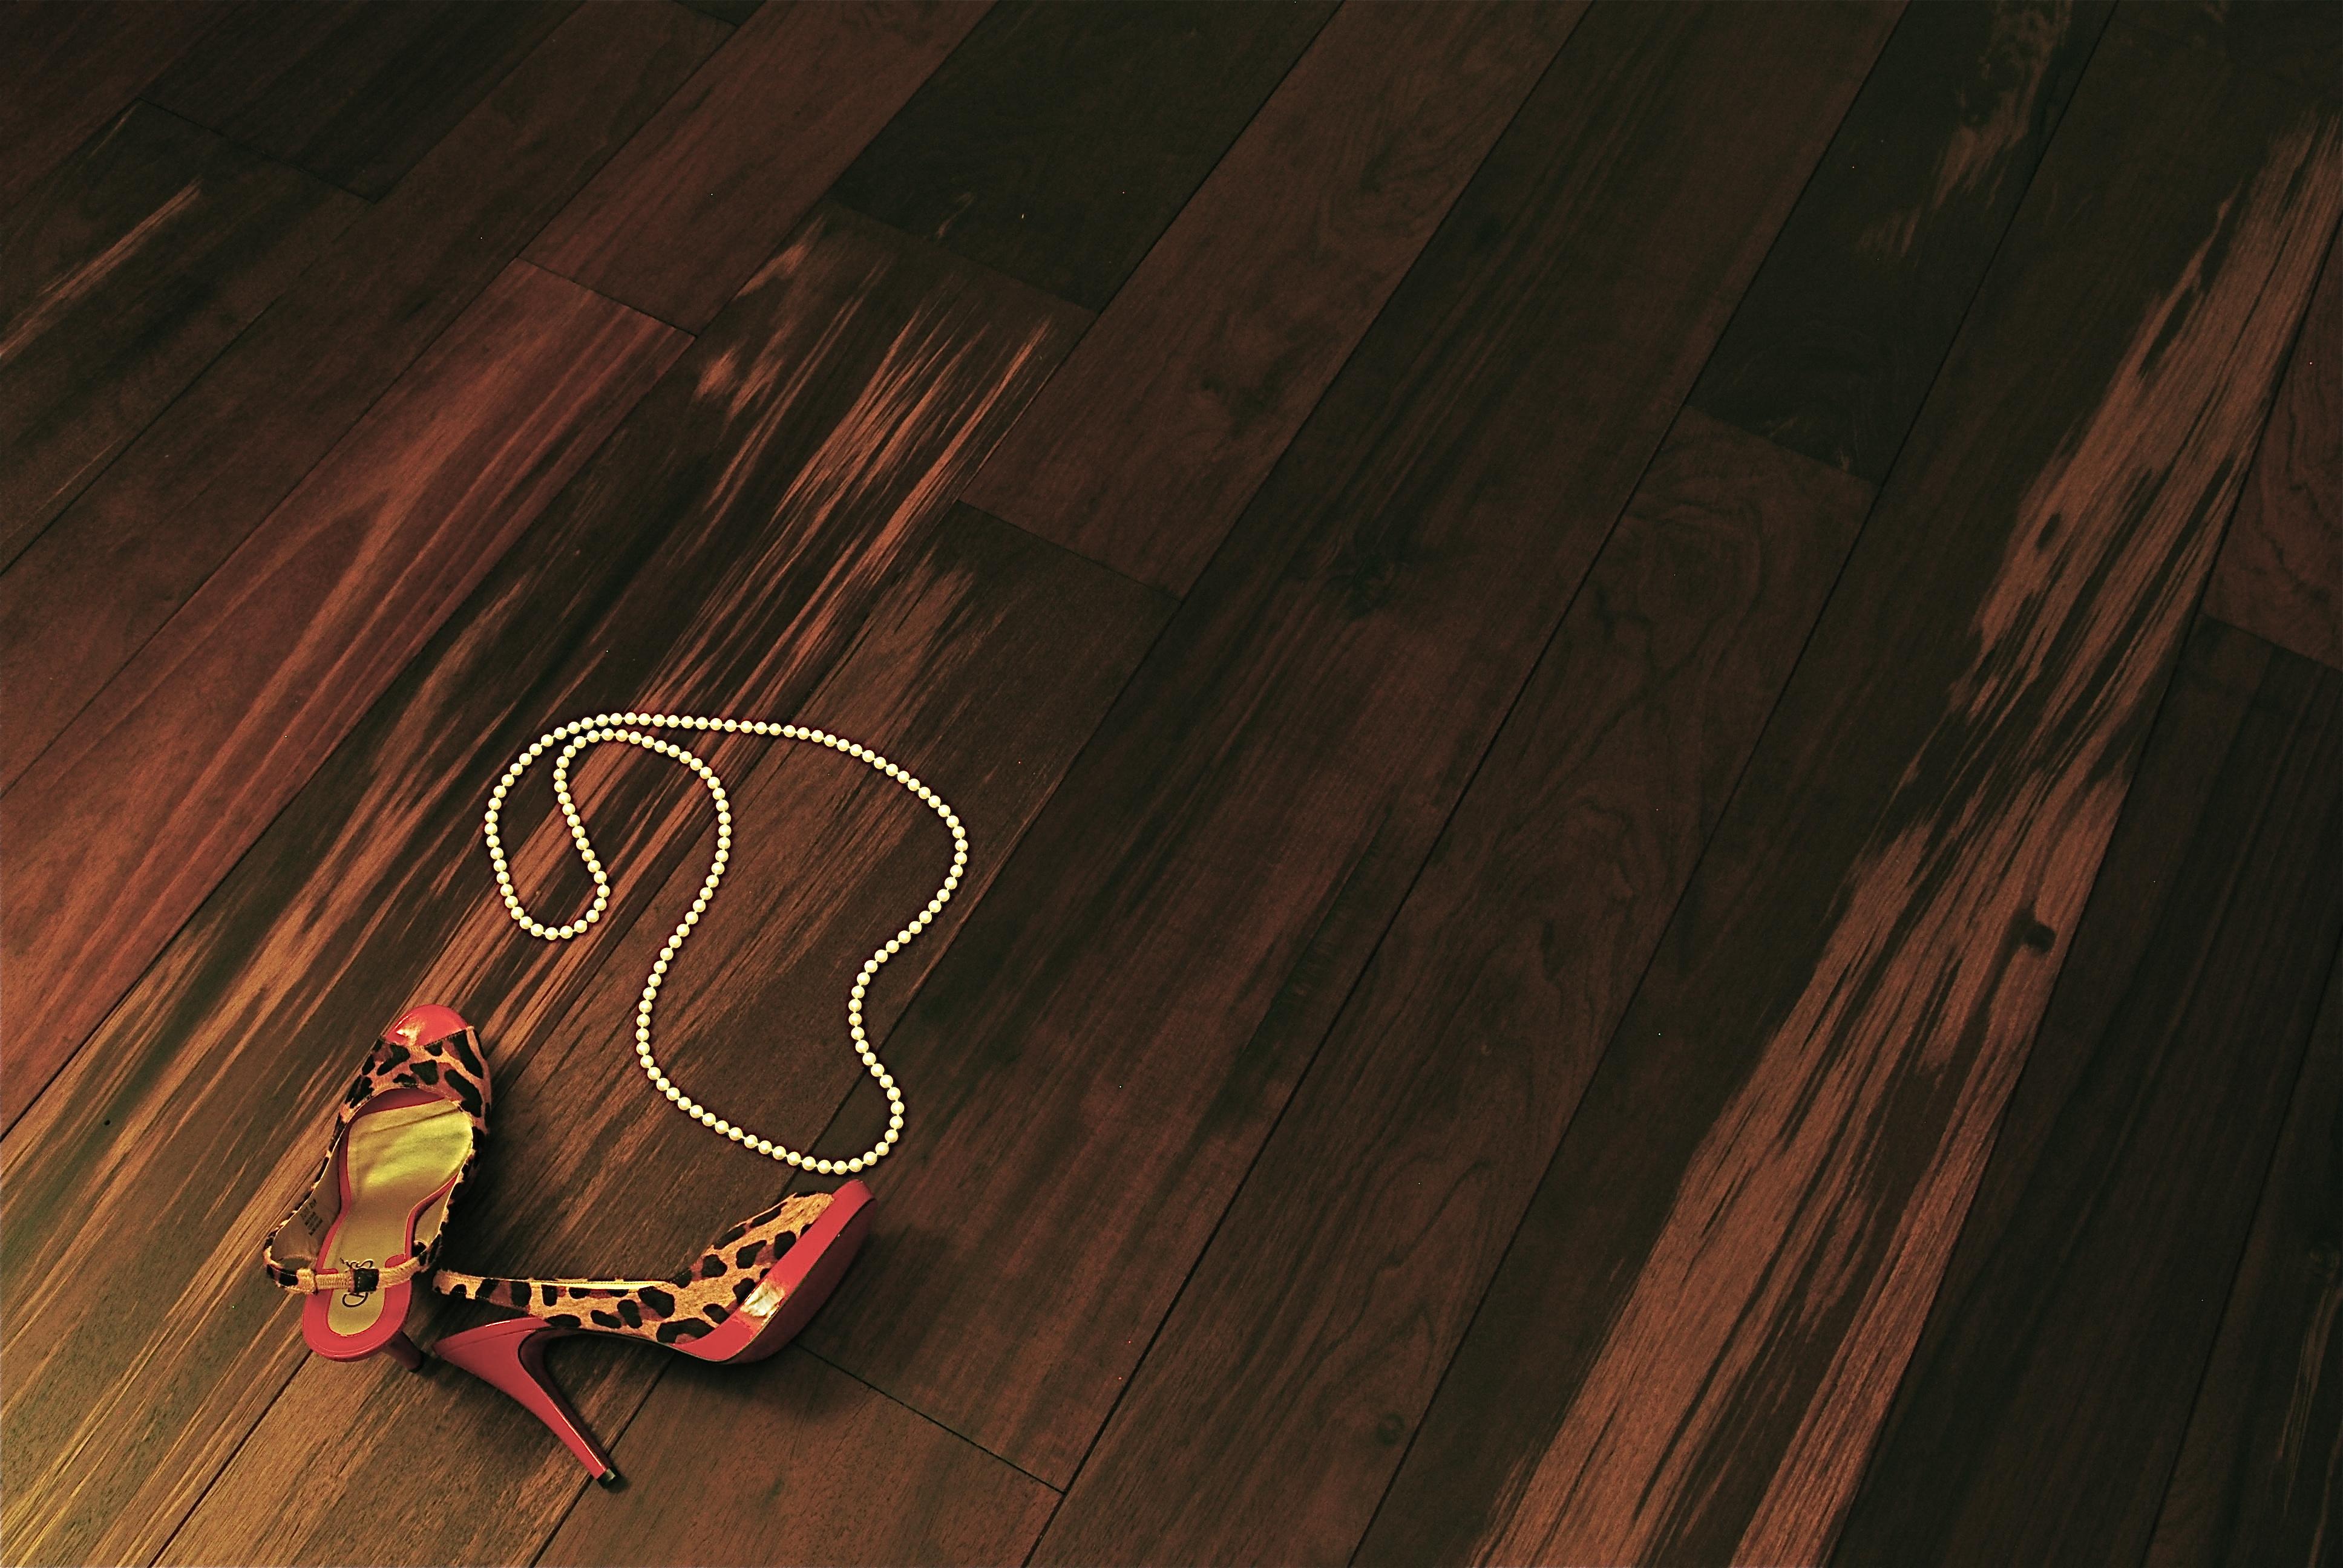 odie's-best-oil-finish-on-exotic-hardwood-floor-0219.jpeg